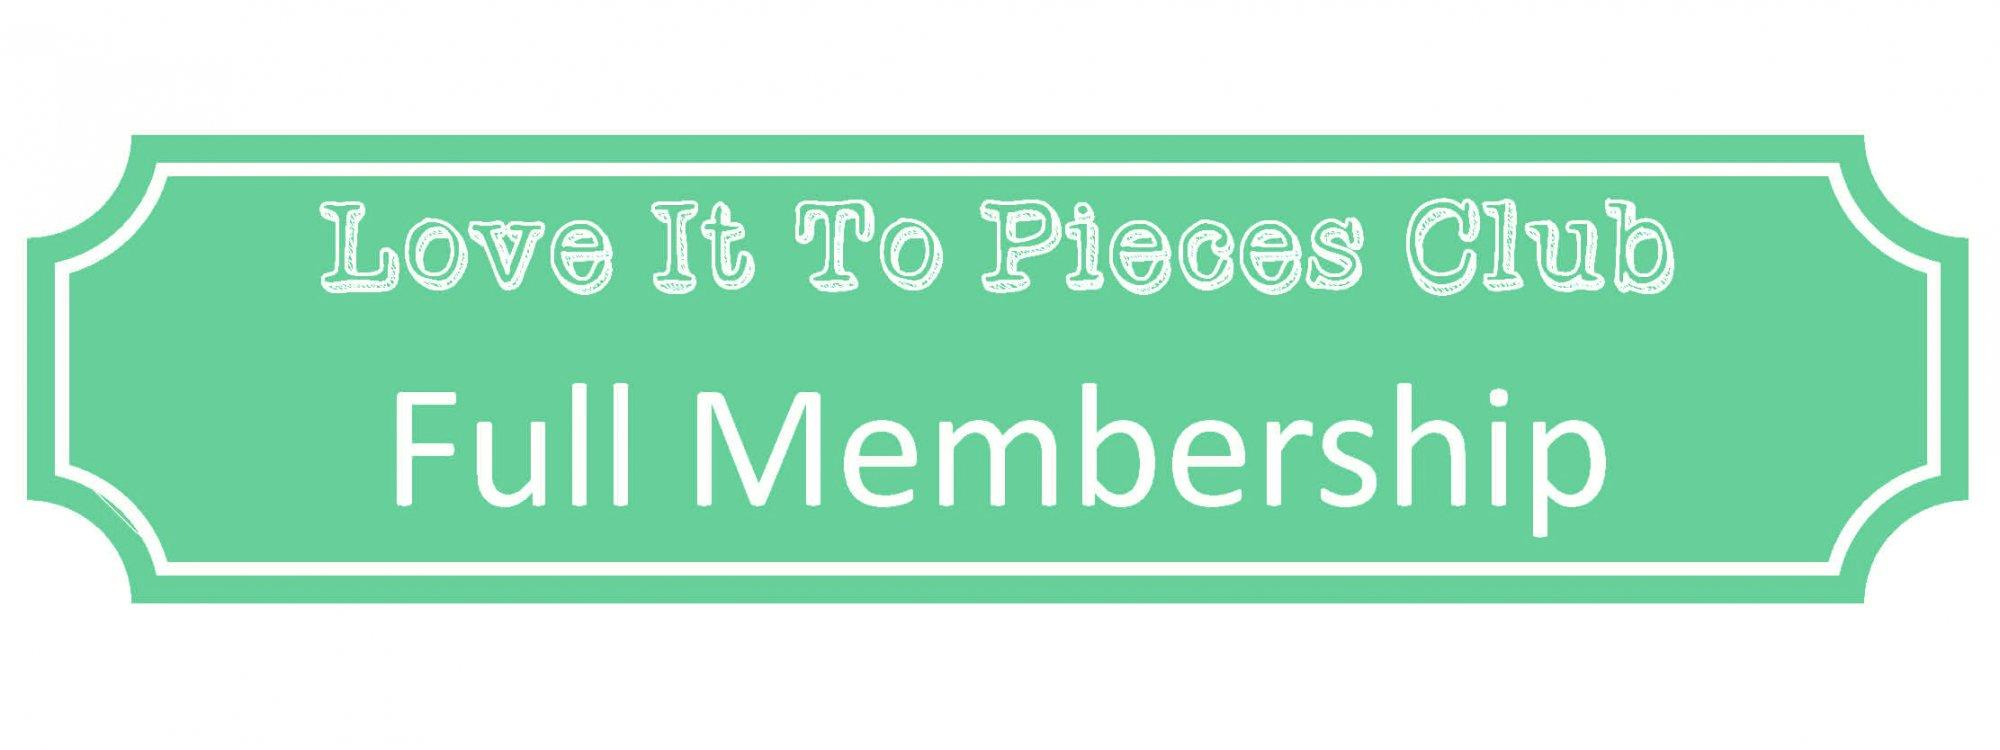 The LITP Club Payment Option: Full Membership FULL